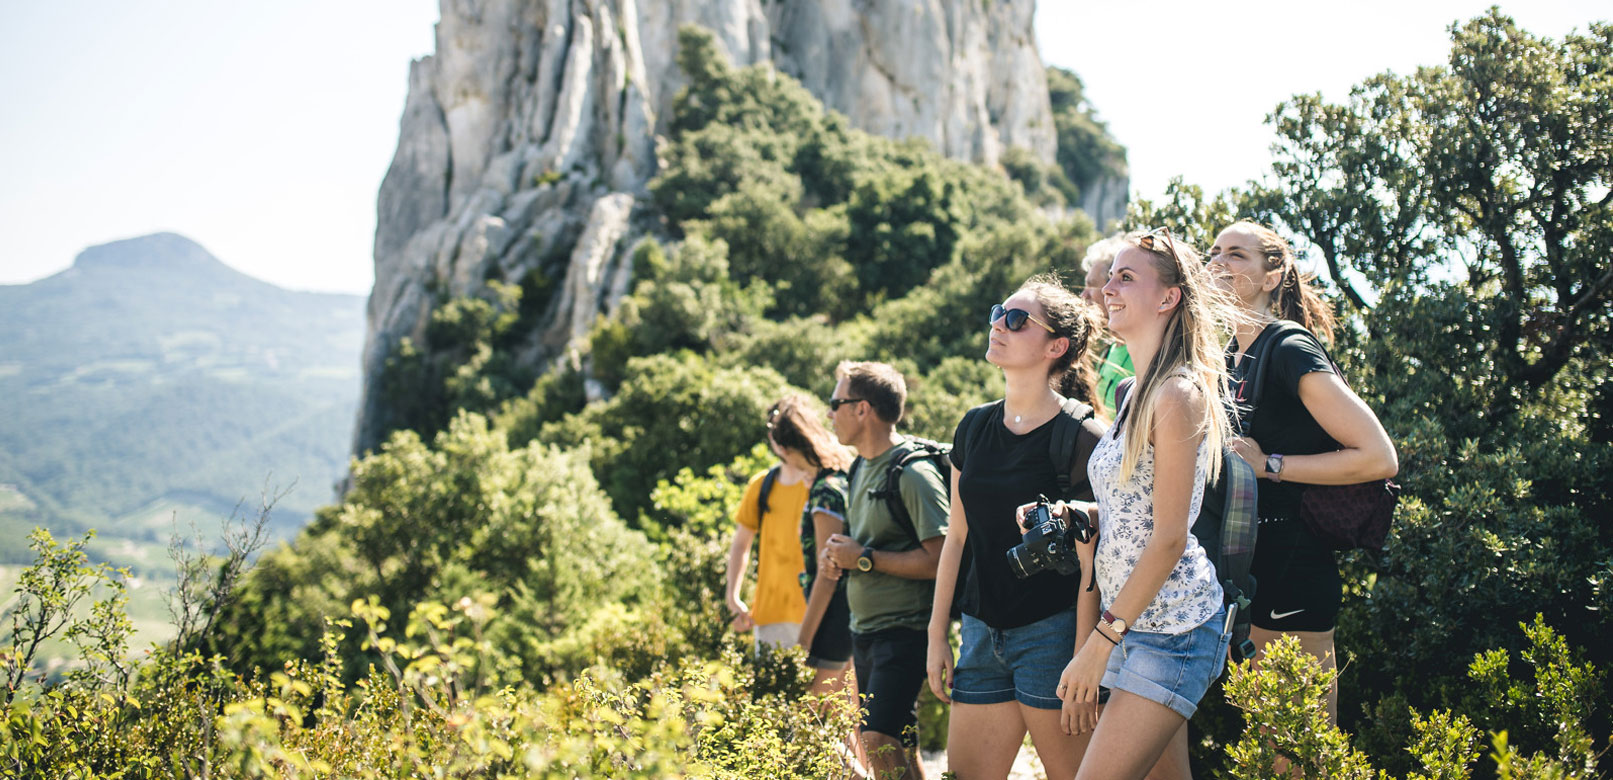 Outdoor activities in Provence © O'Brien3